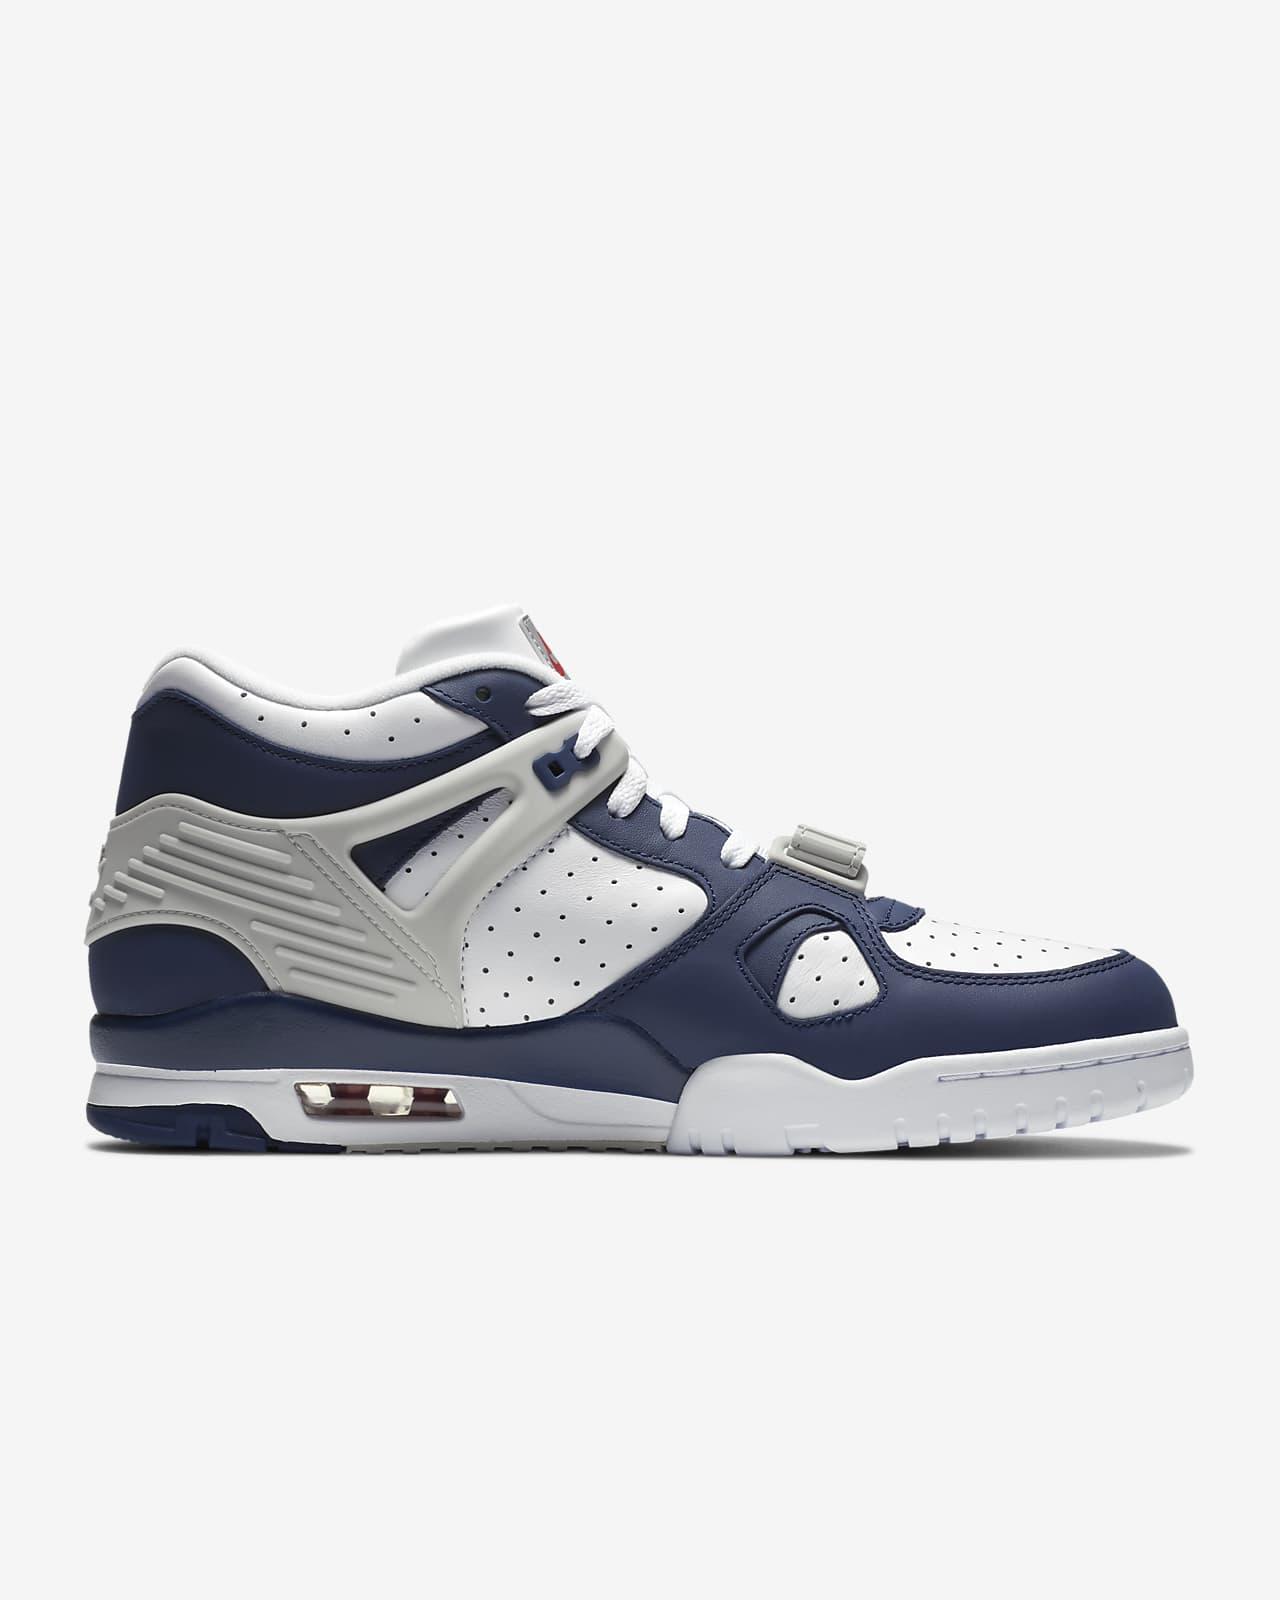 Noroeste partido Republicano Reportero  Nike Air Trainer 3 Shoe. Nike LU